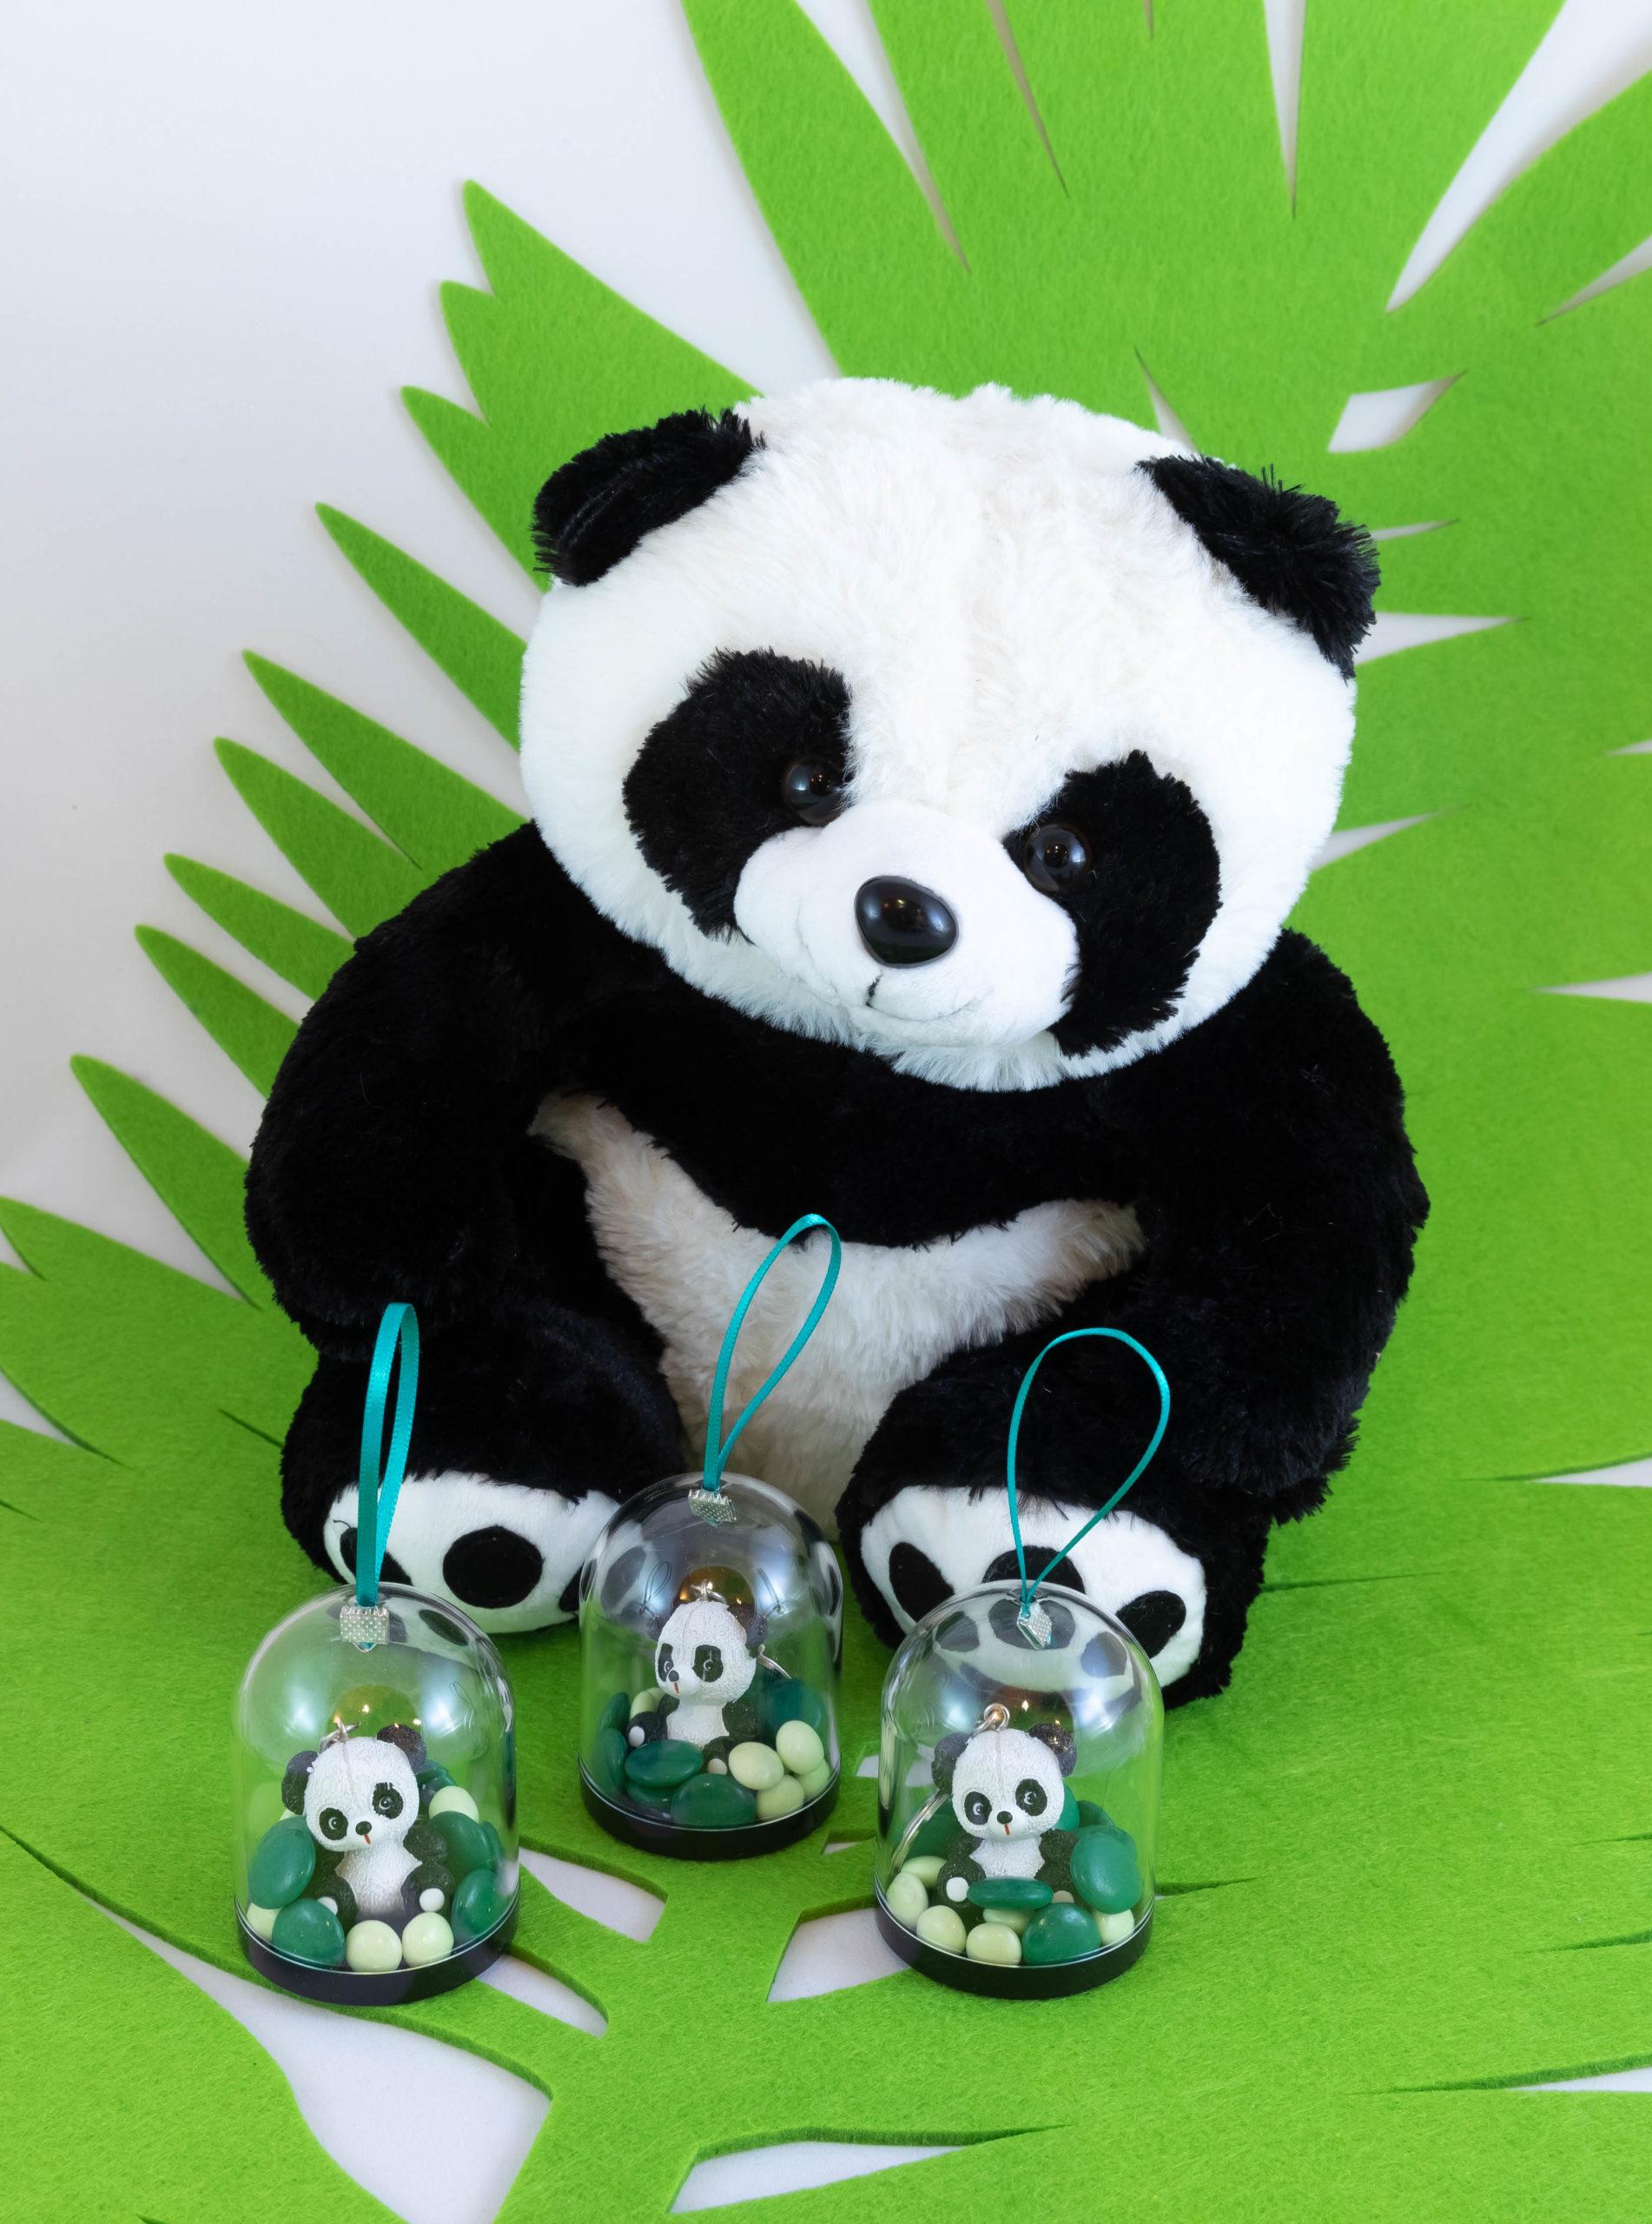 Globe - Panda Image